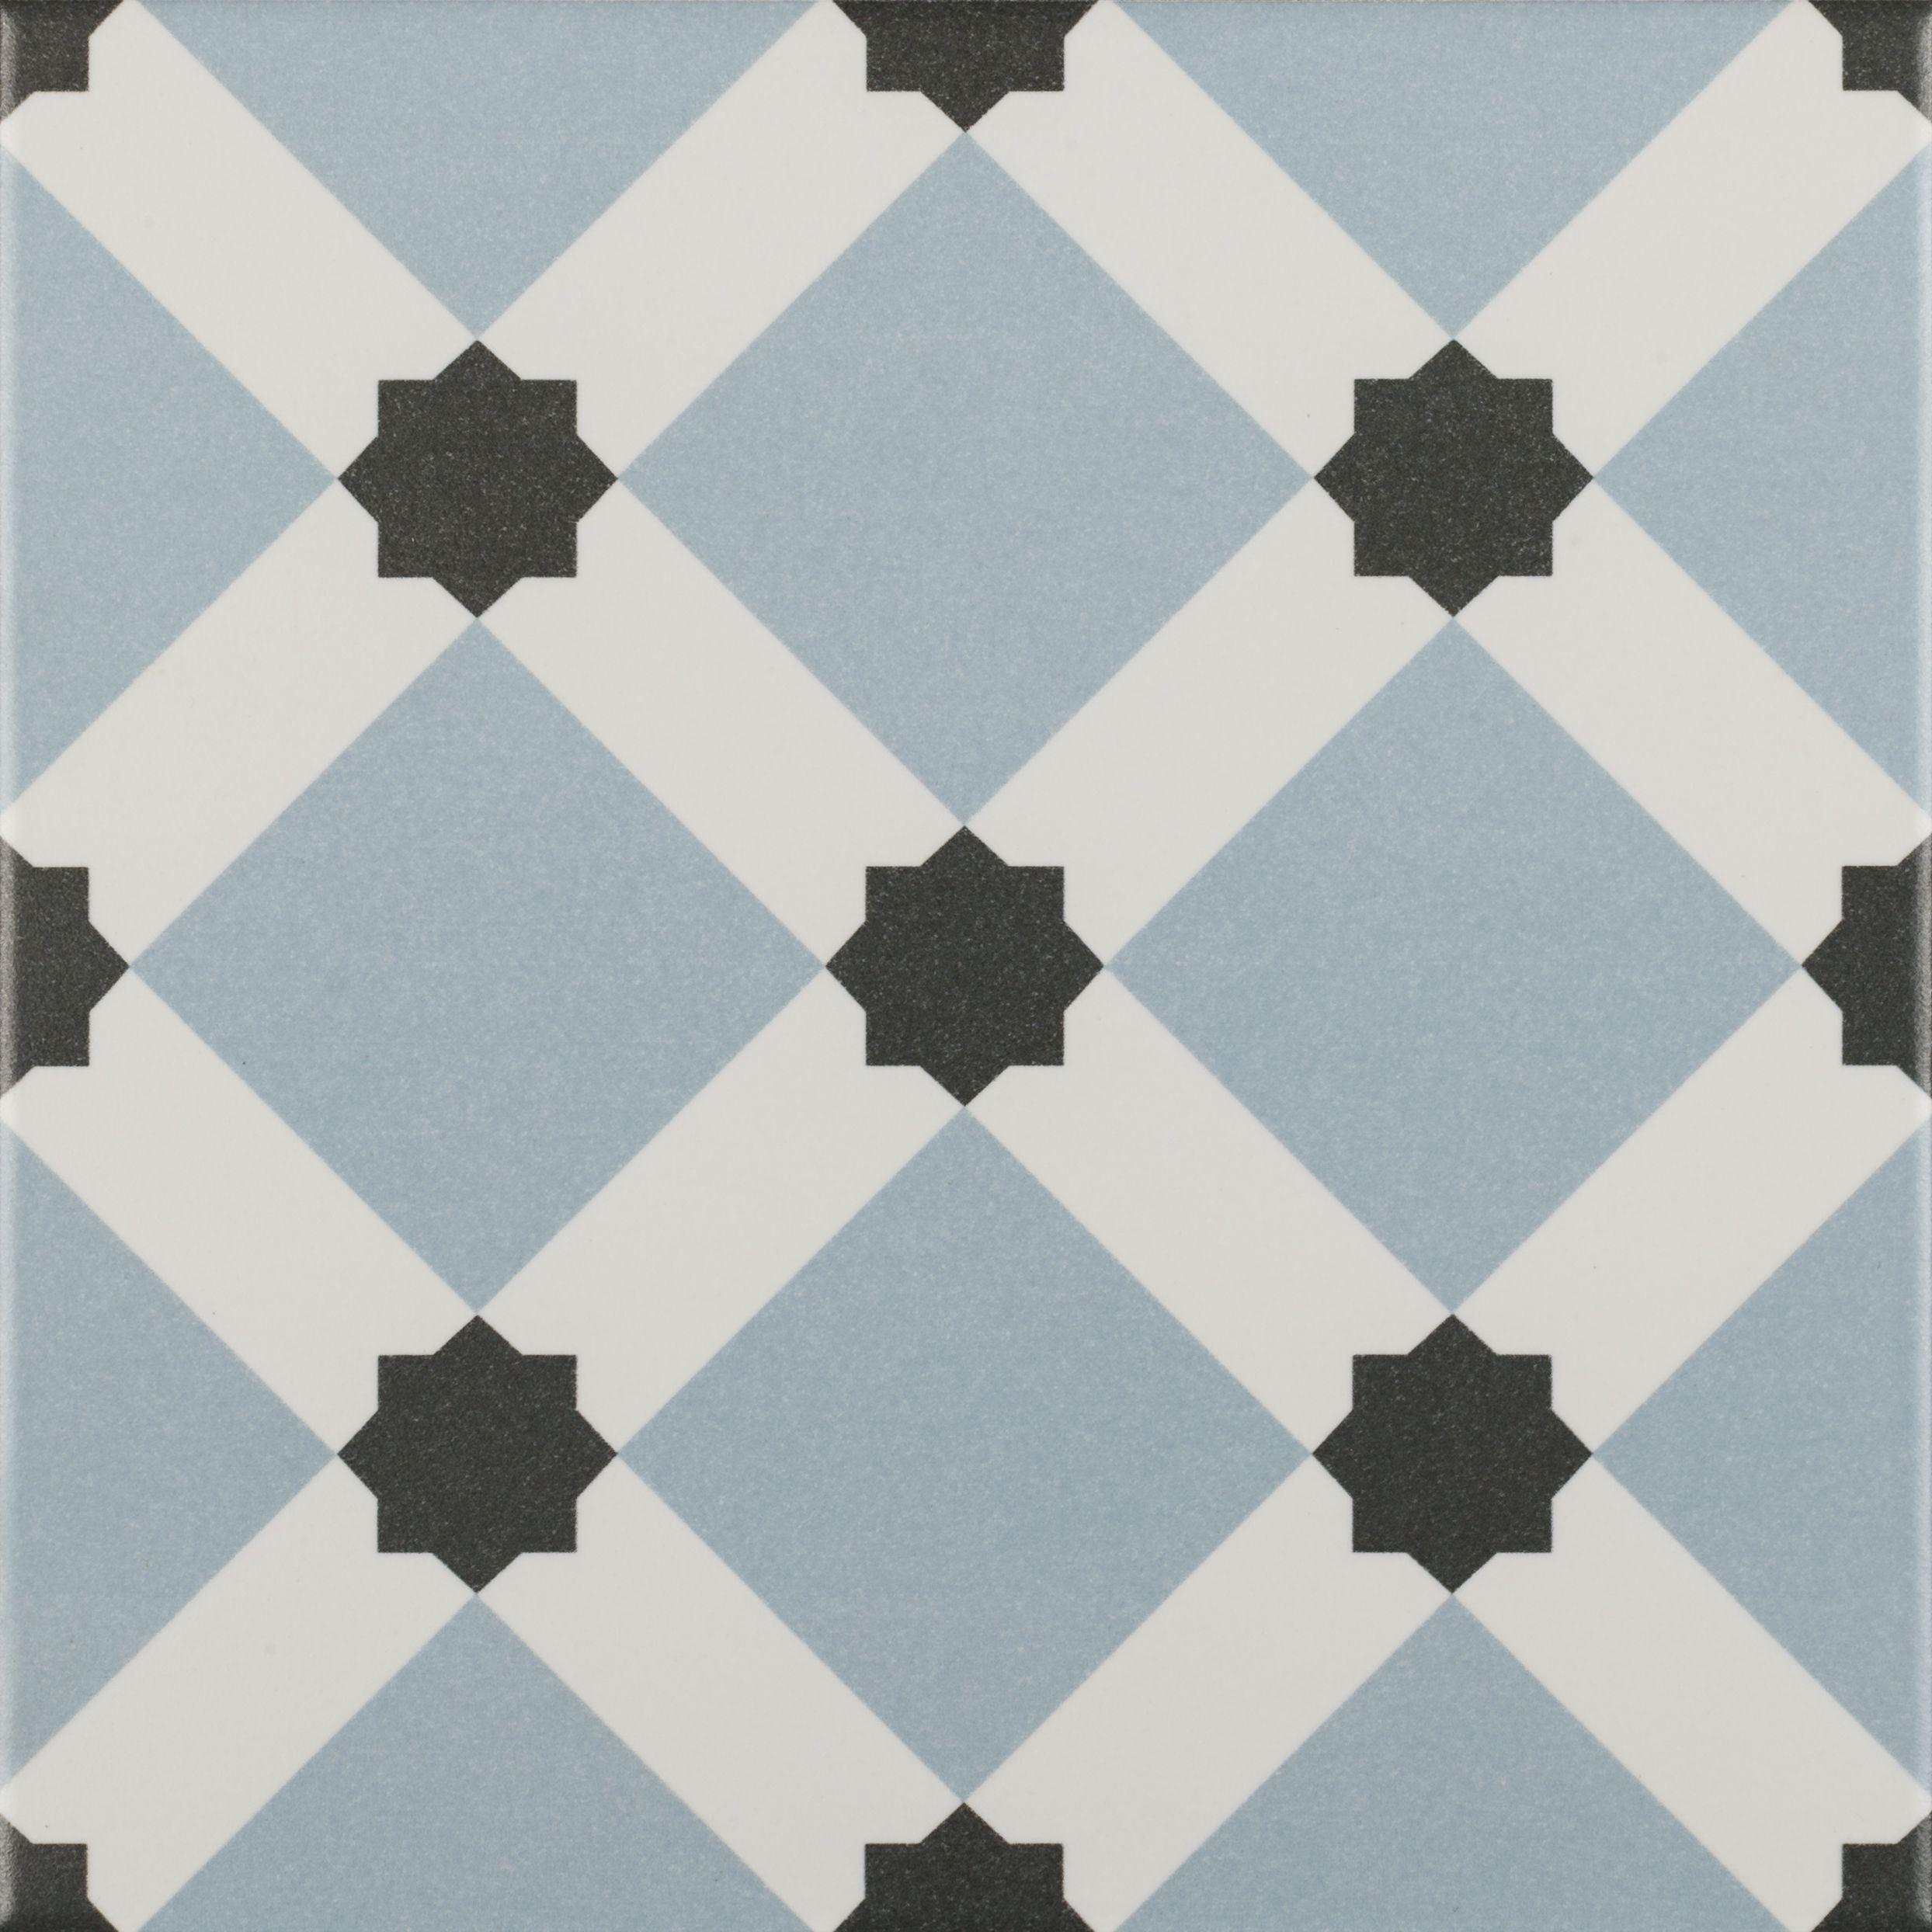 Collection Palau 20x20 cm Matt | Inredning och design | Pinterest